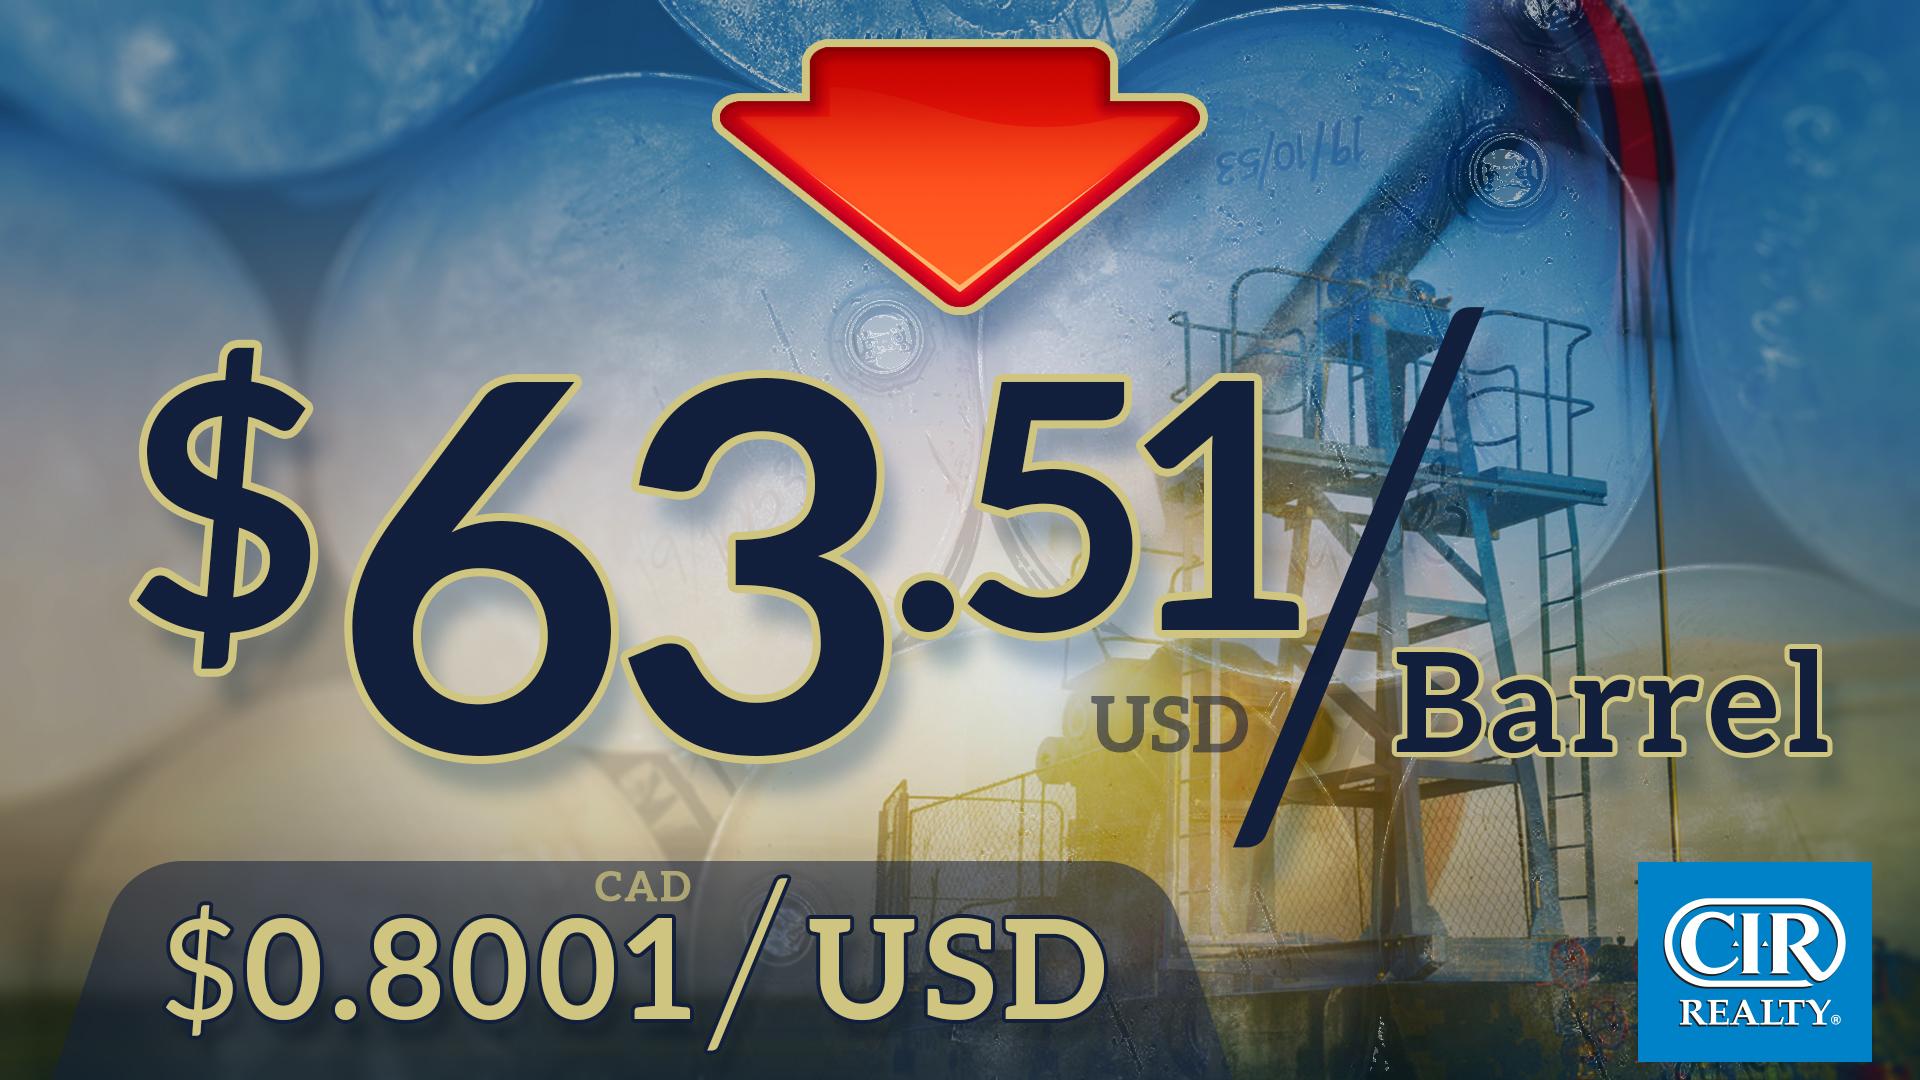 Oil Prices Jan 22, 2018